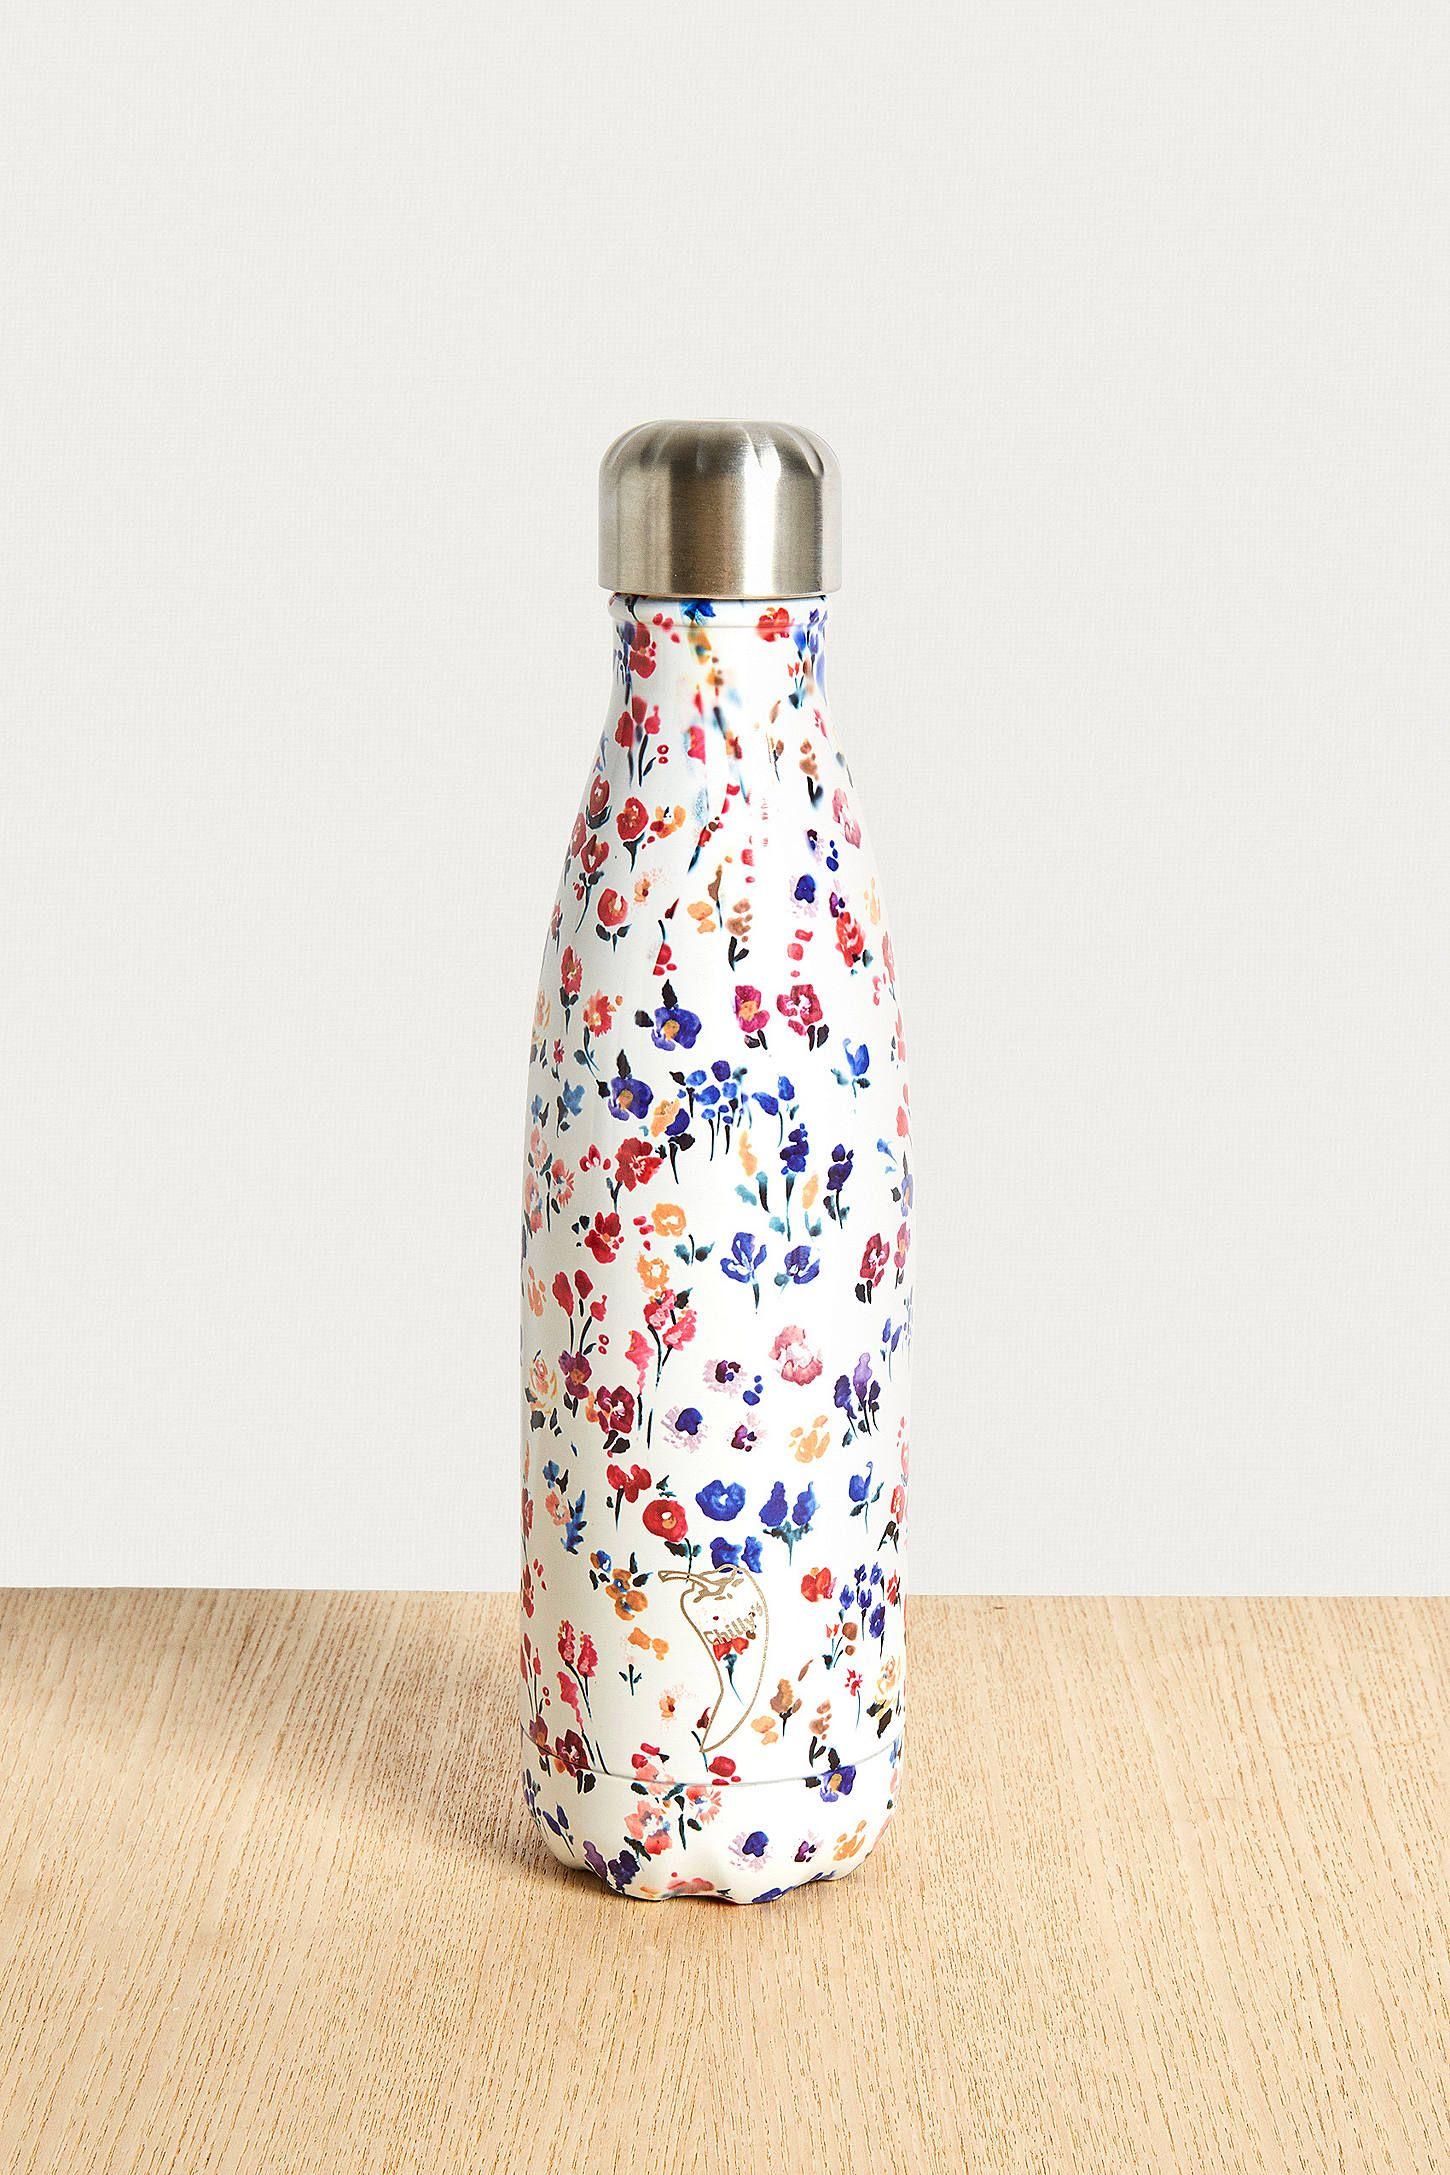 cdd16390bd Cisco Stainless Steel Water Bottle | Waterbottles | Water bottle, Stainless water  bottle, Bottle